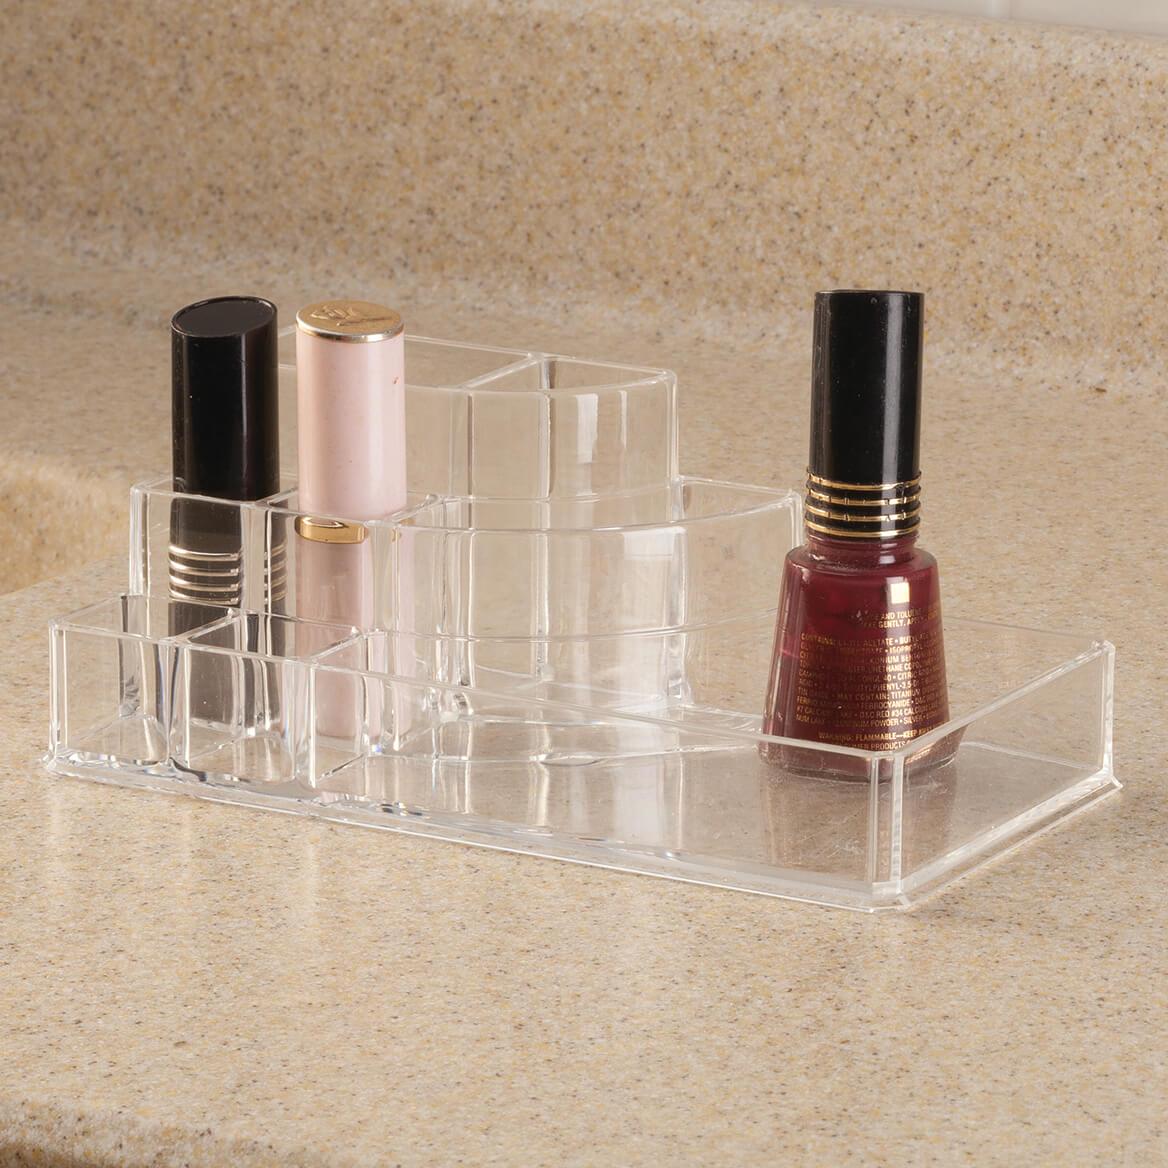 Multi-Tier Make-Up Organizer-366064